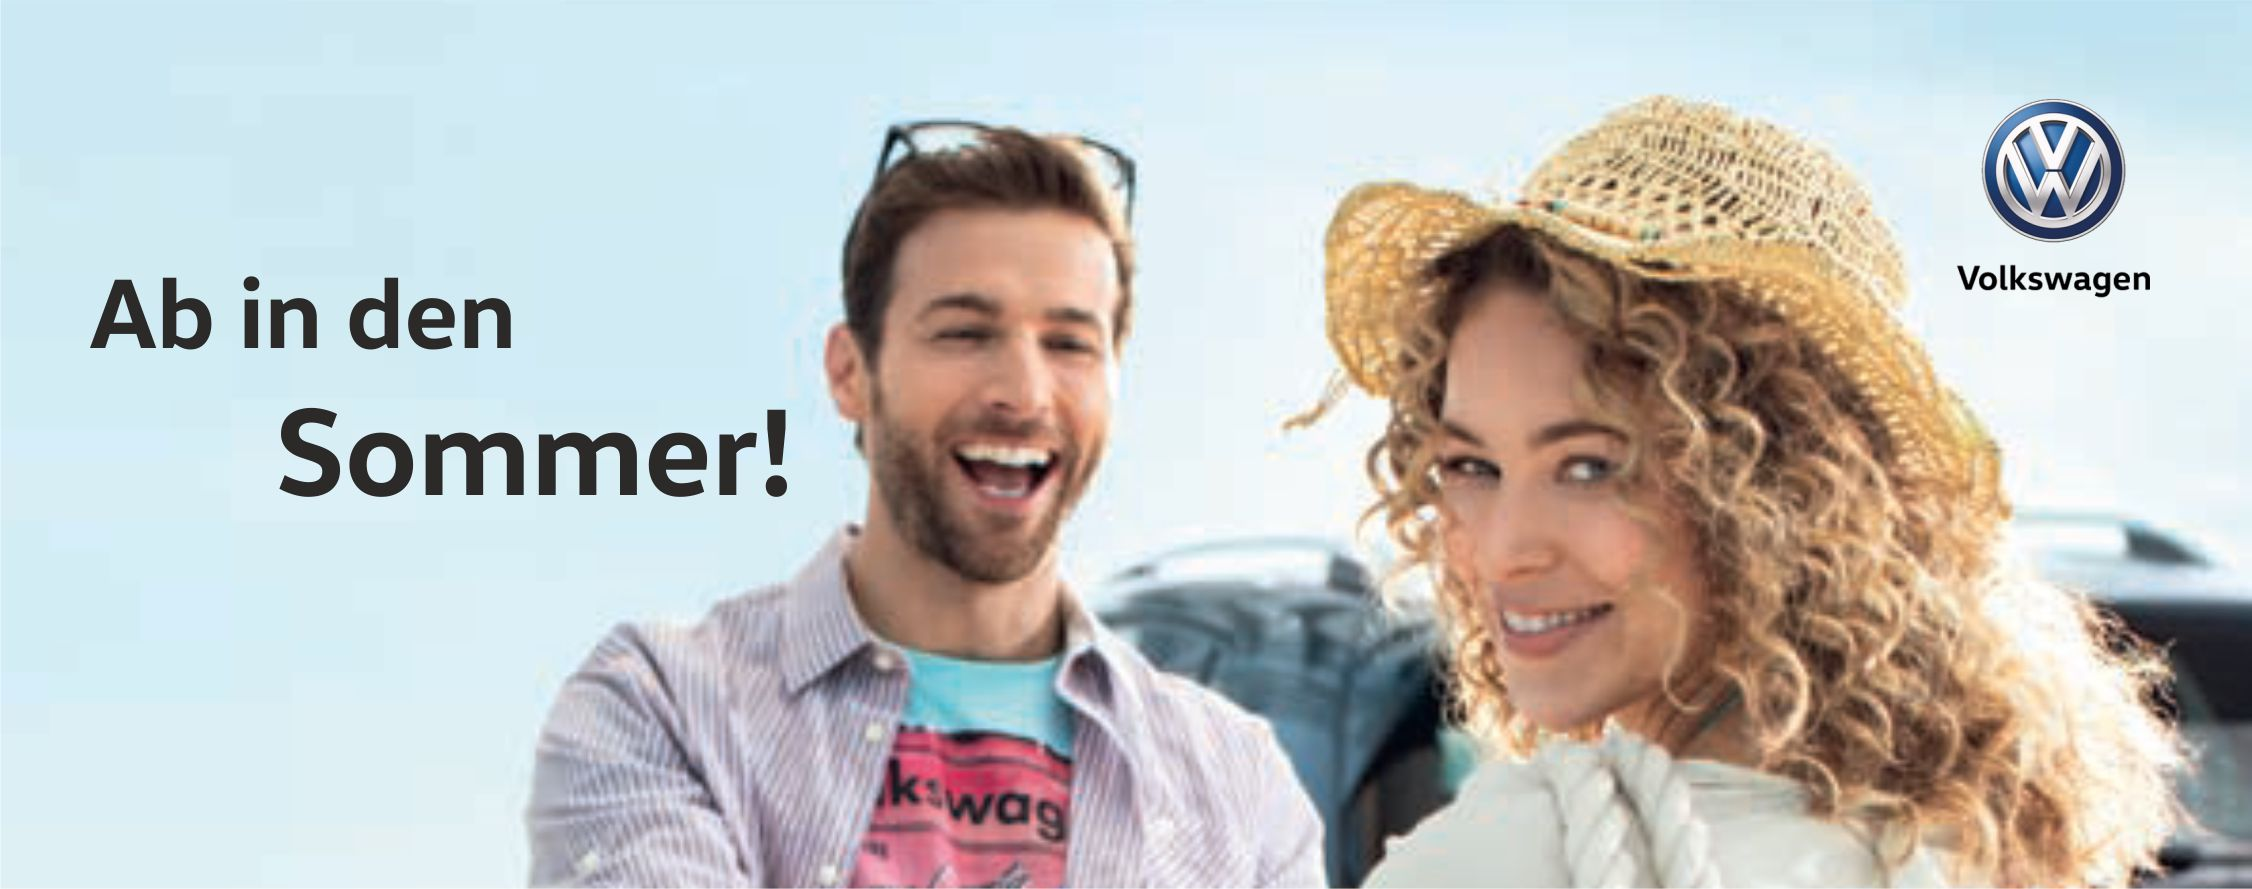 Volkswagen Service Angebote Sommer 2019